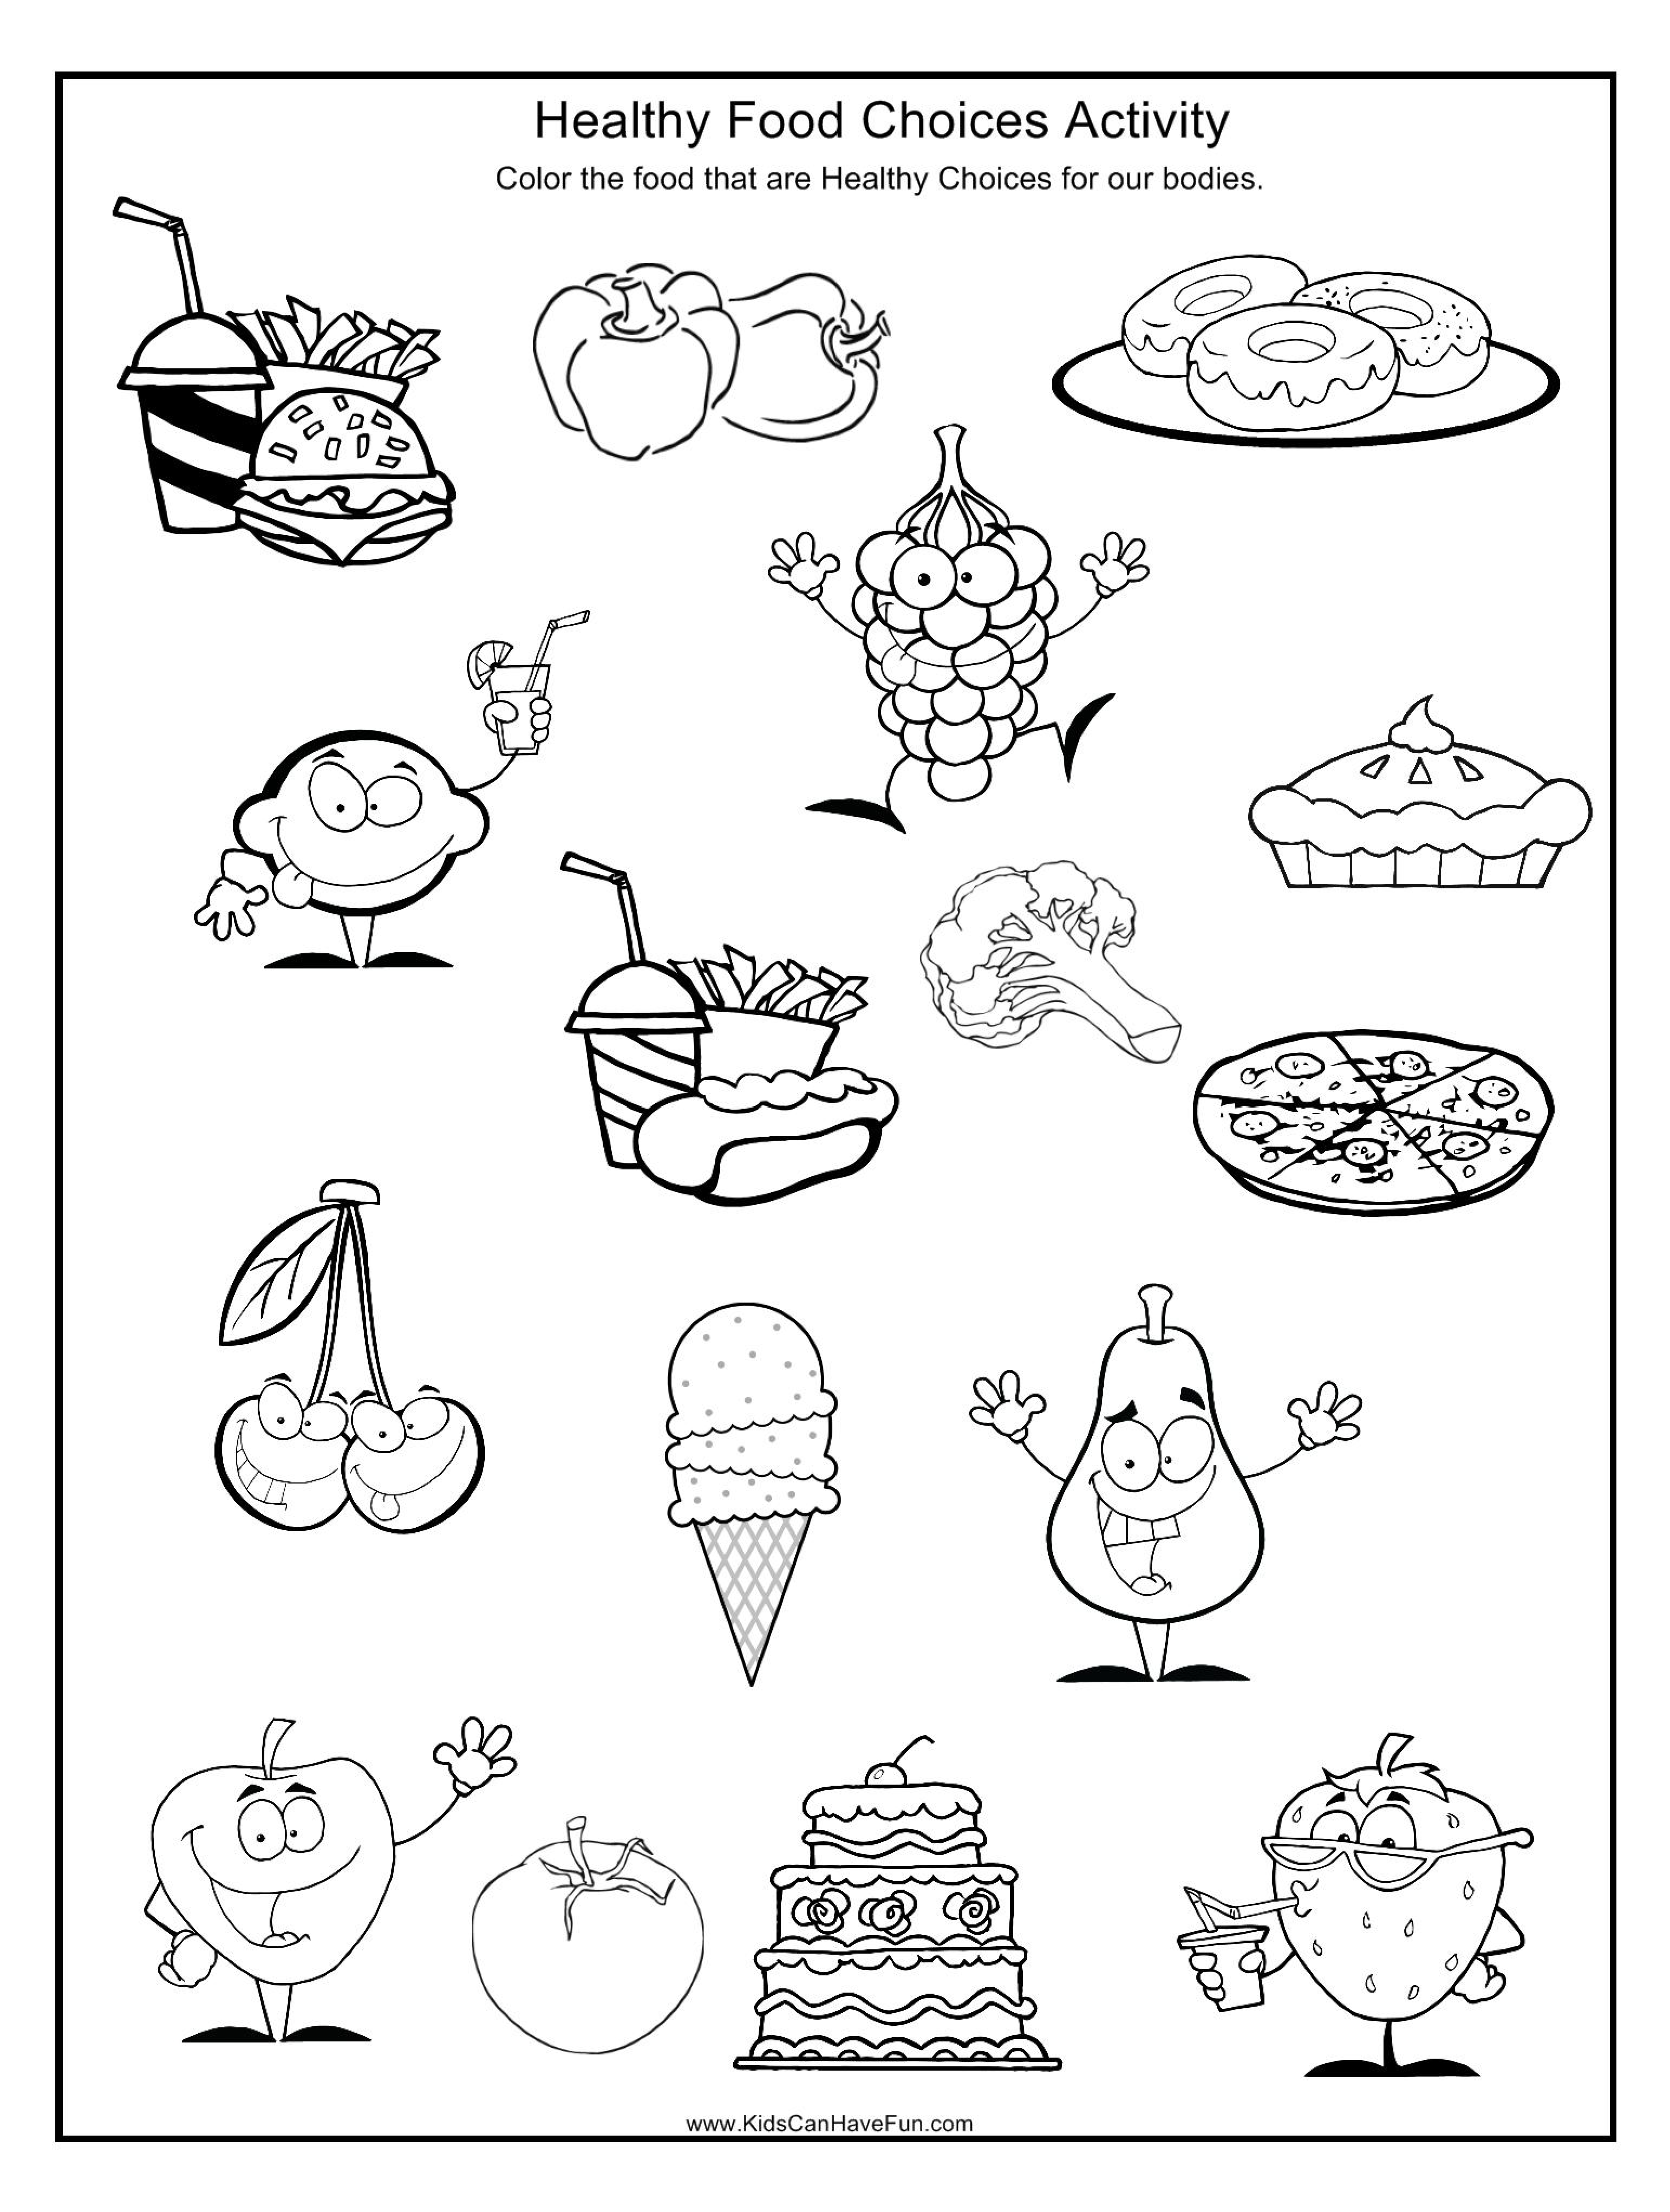 worksheet for kindergarten food image result for food worksheets for kindergarten pdf food for worksheet kindergarten